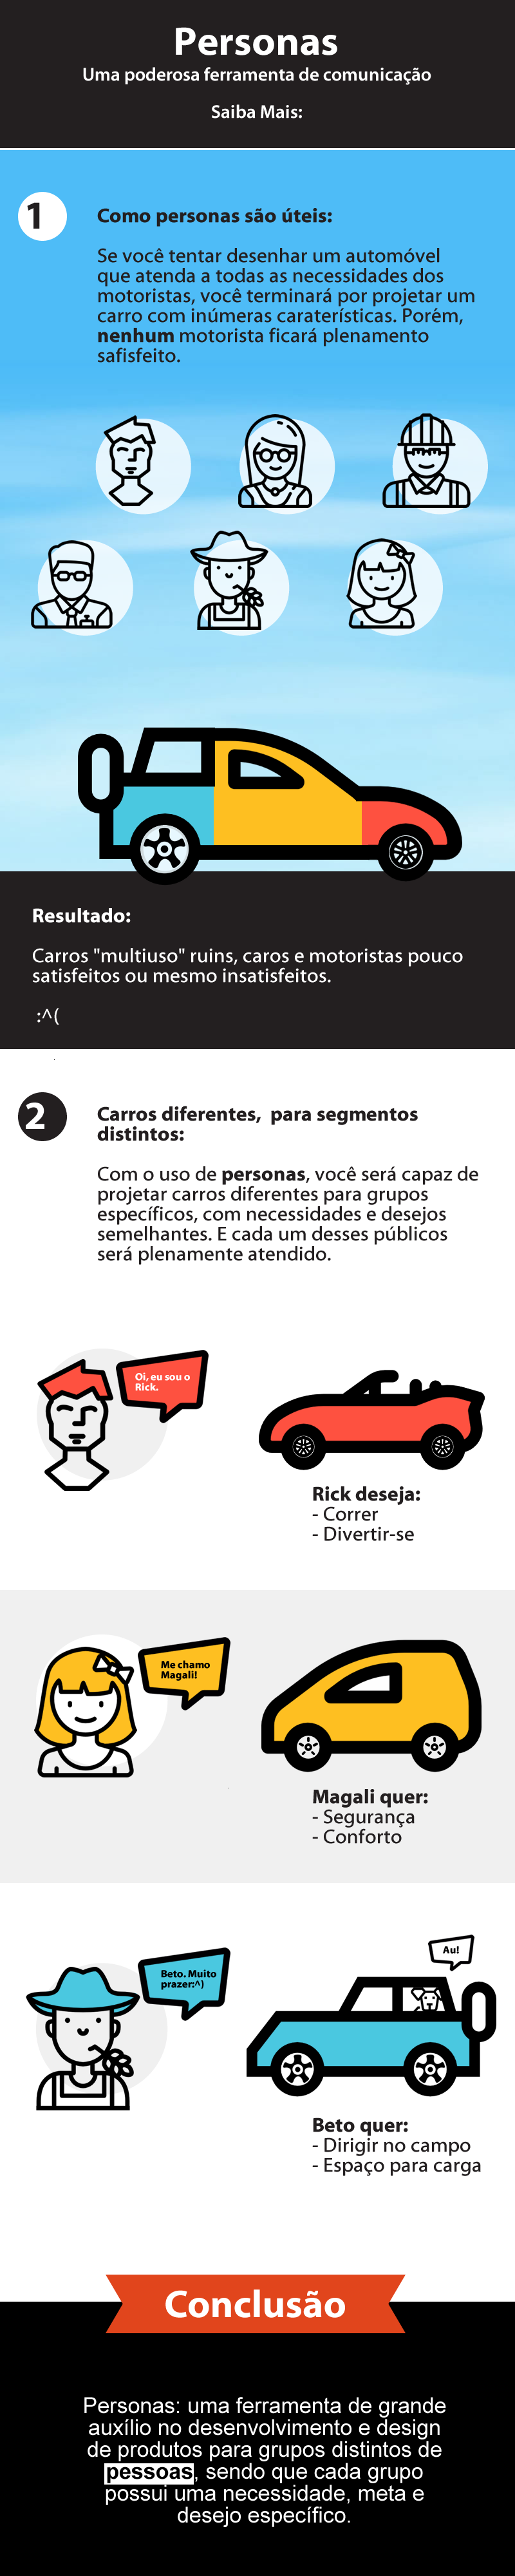 infografico-personas